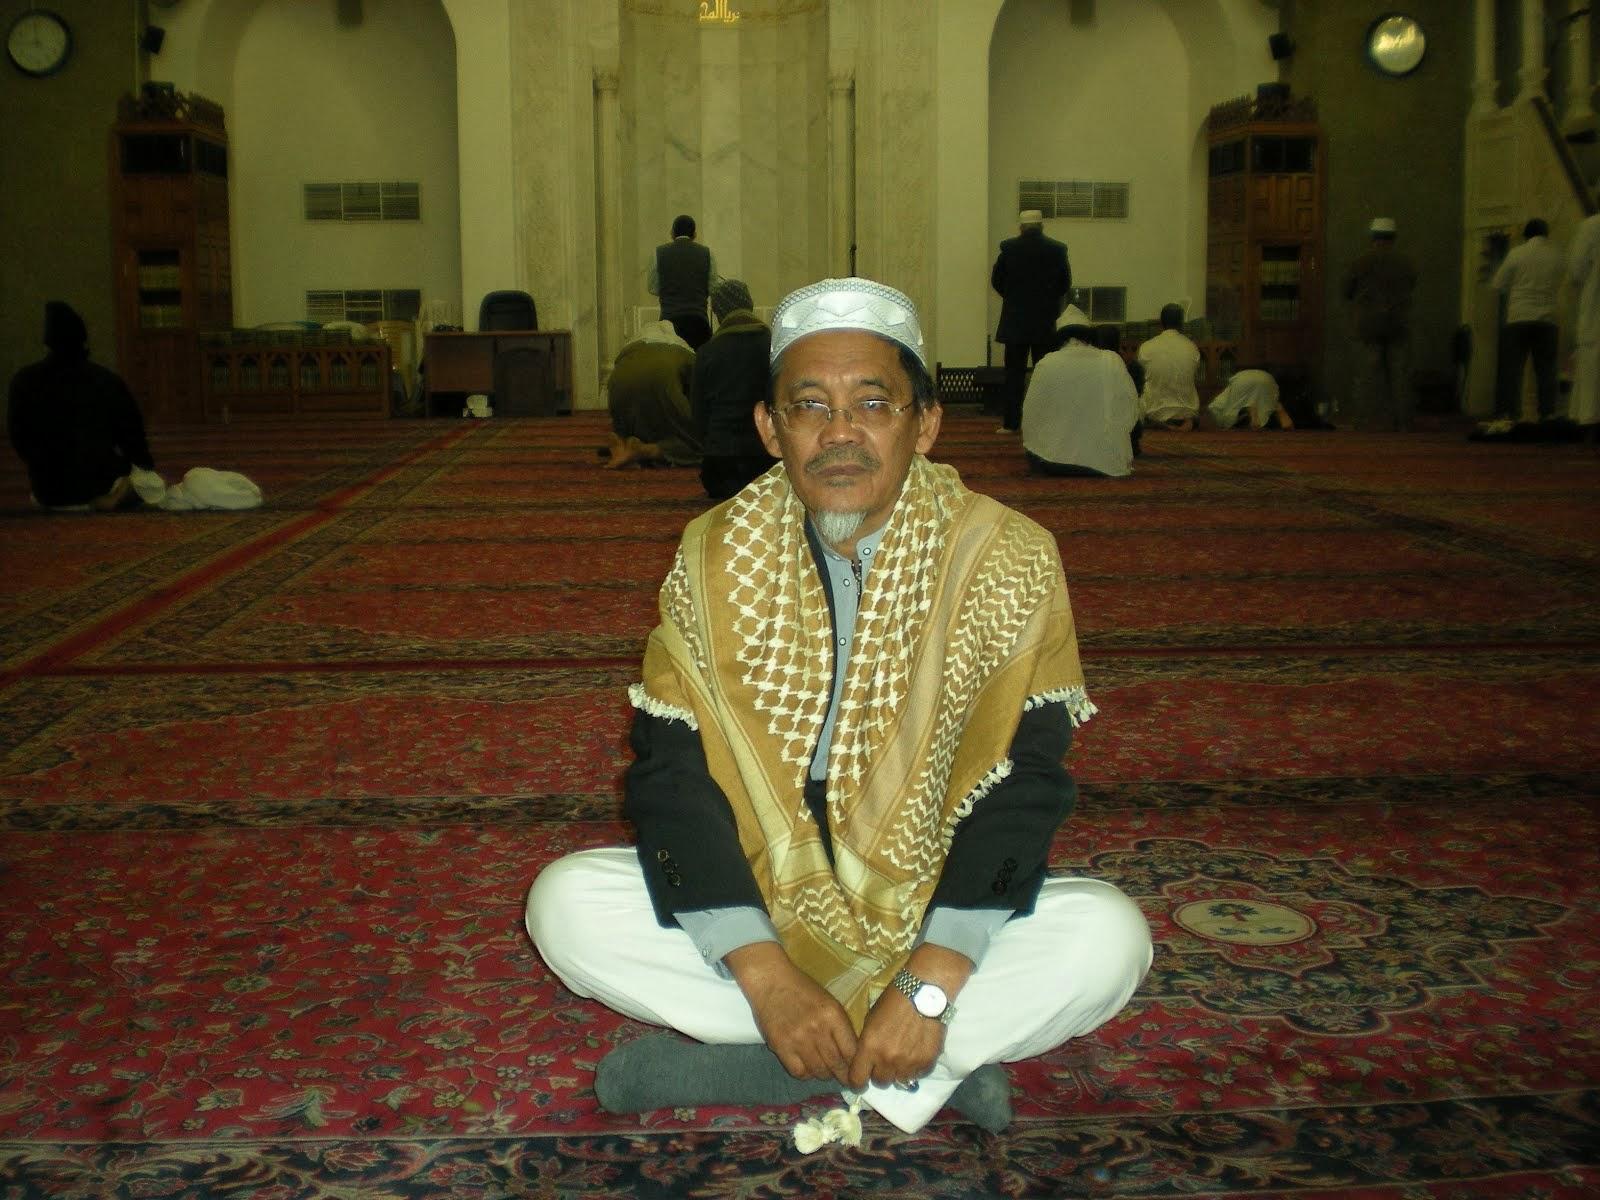 Inside Masjid Kubah